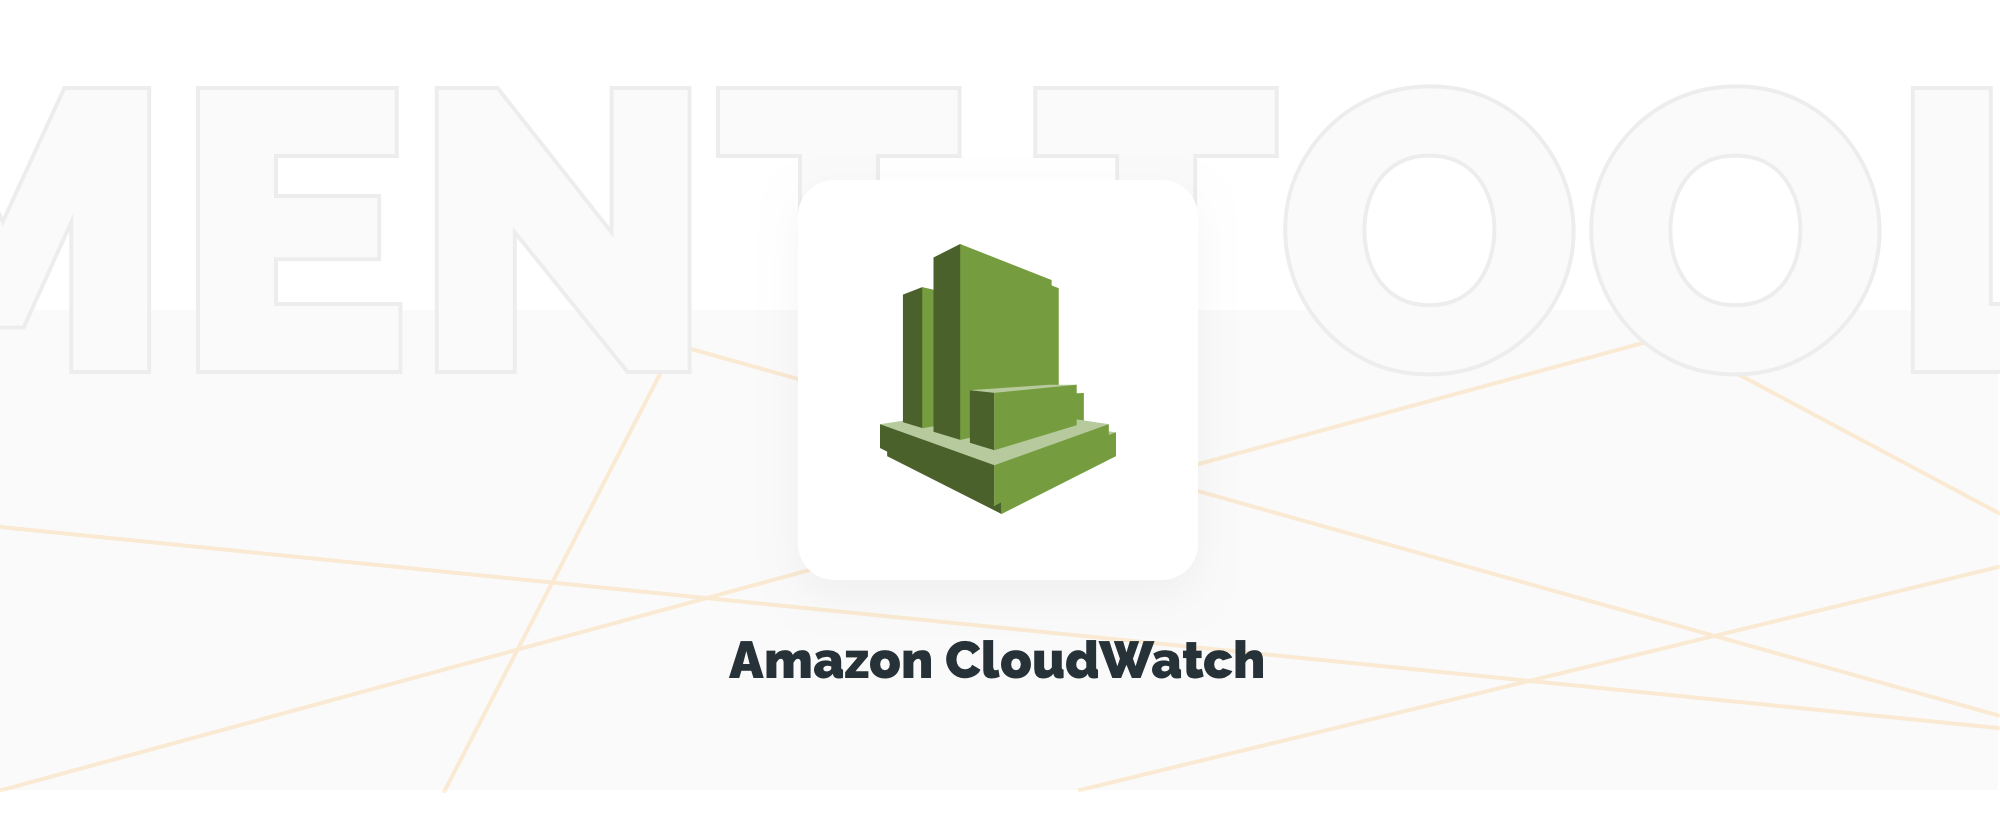 Amazon CloudWatch